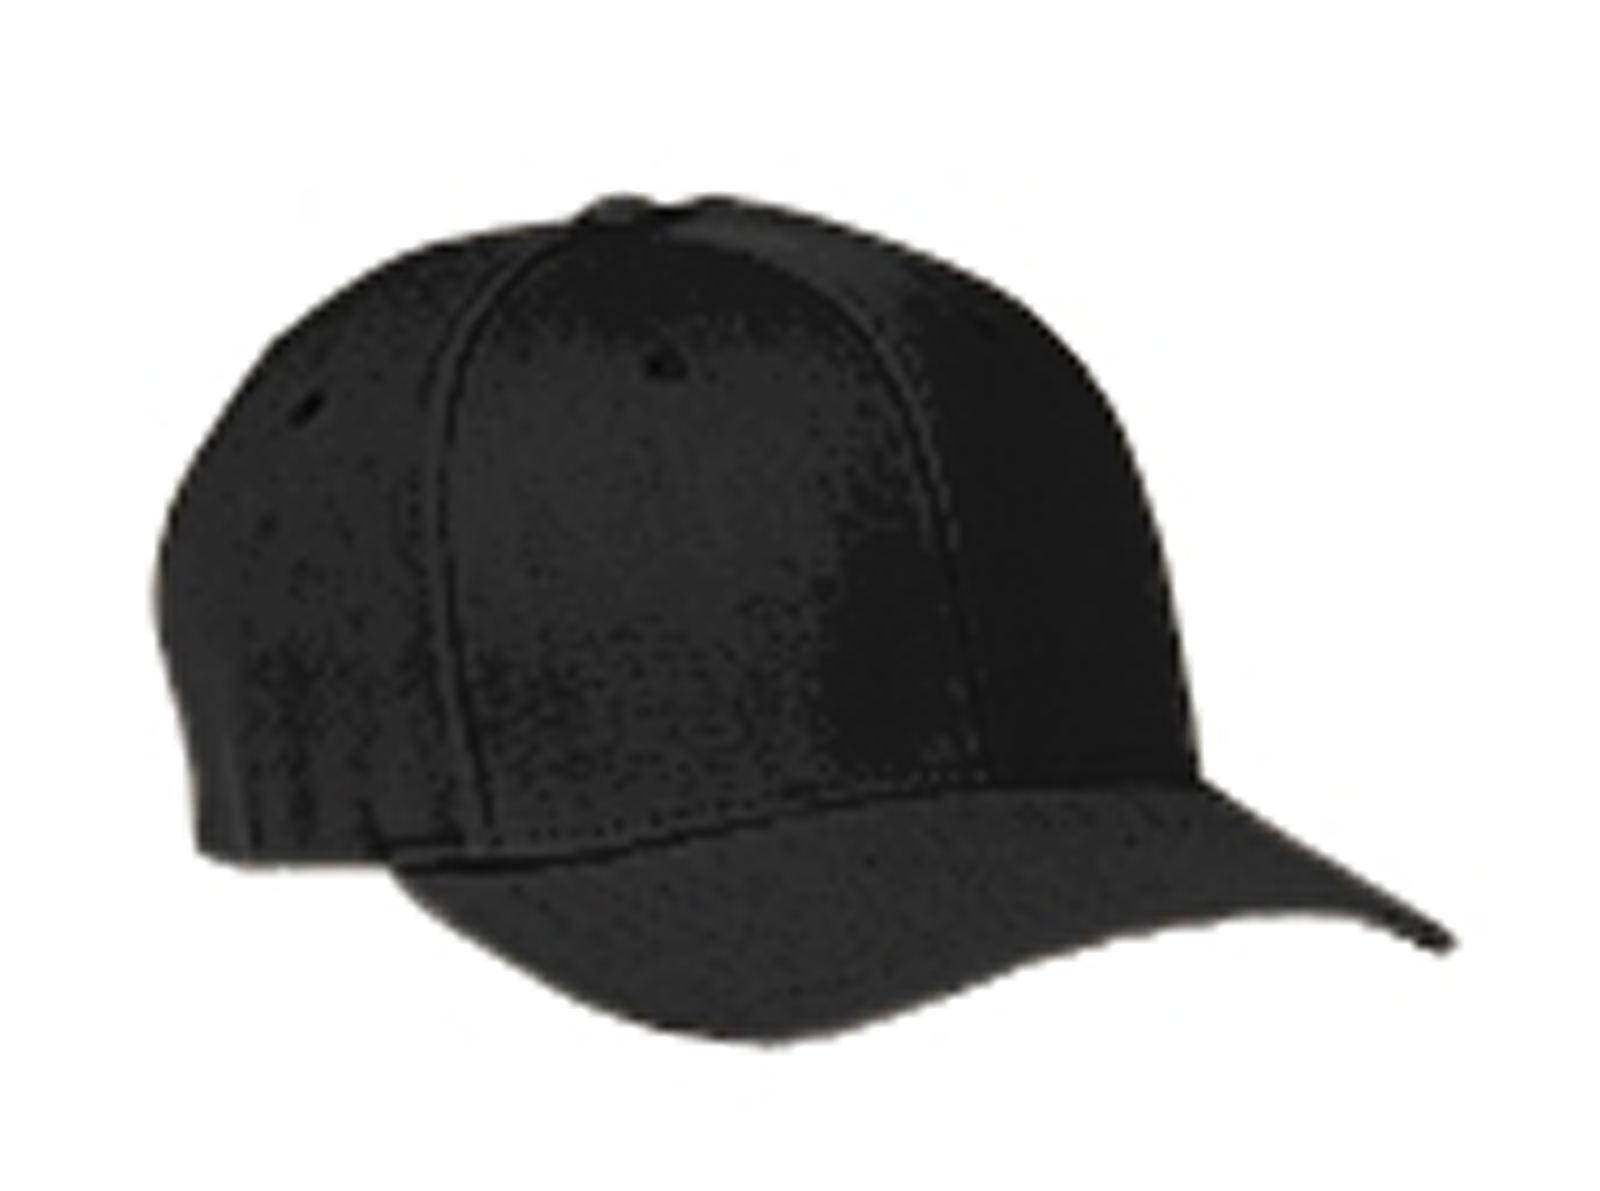 Flexfit 6477 Structured Wool Cap